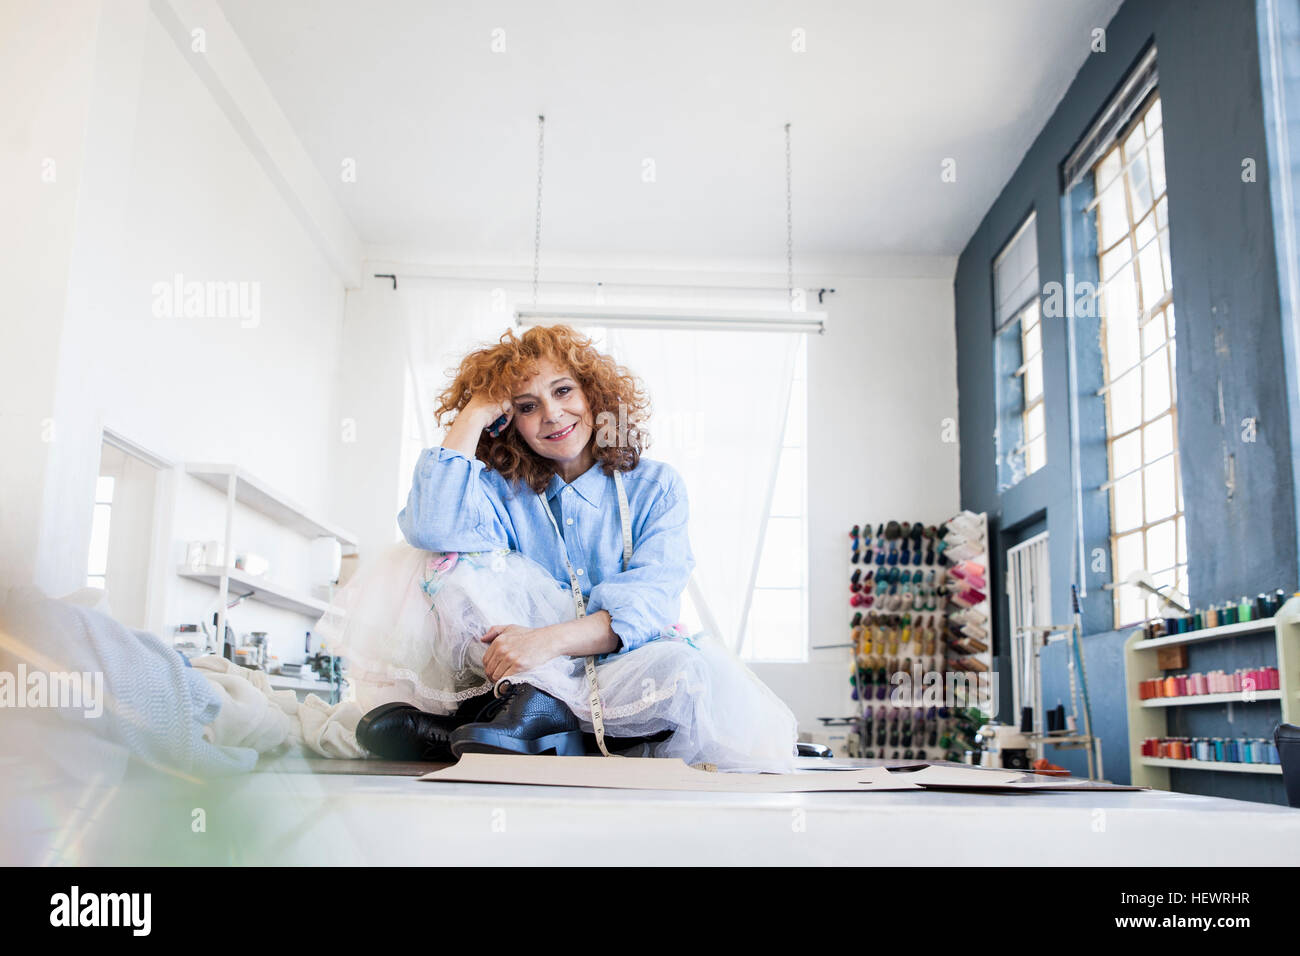 Fashion designer sitting cross-legged on desk looking at camera smiling - Stock Image